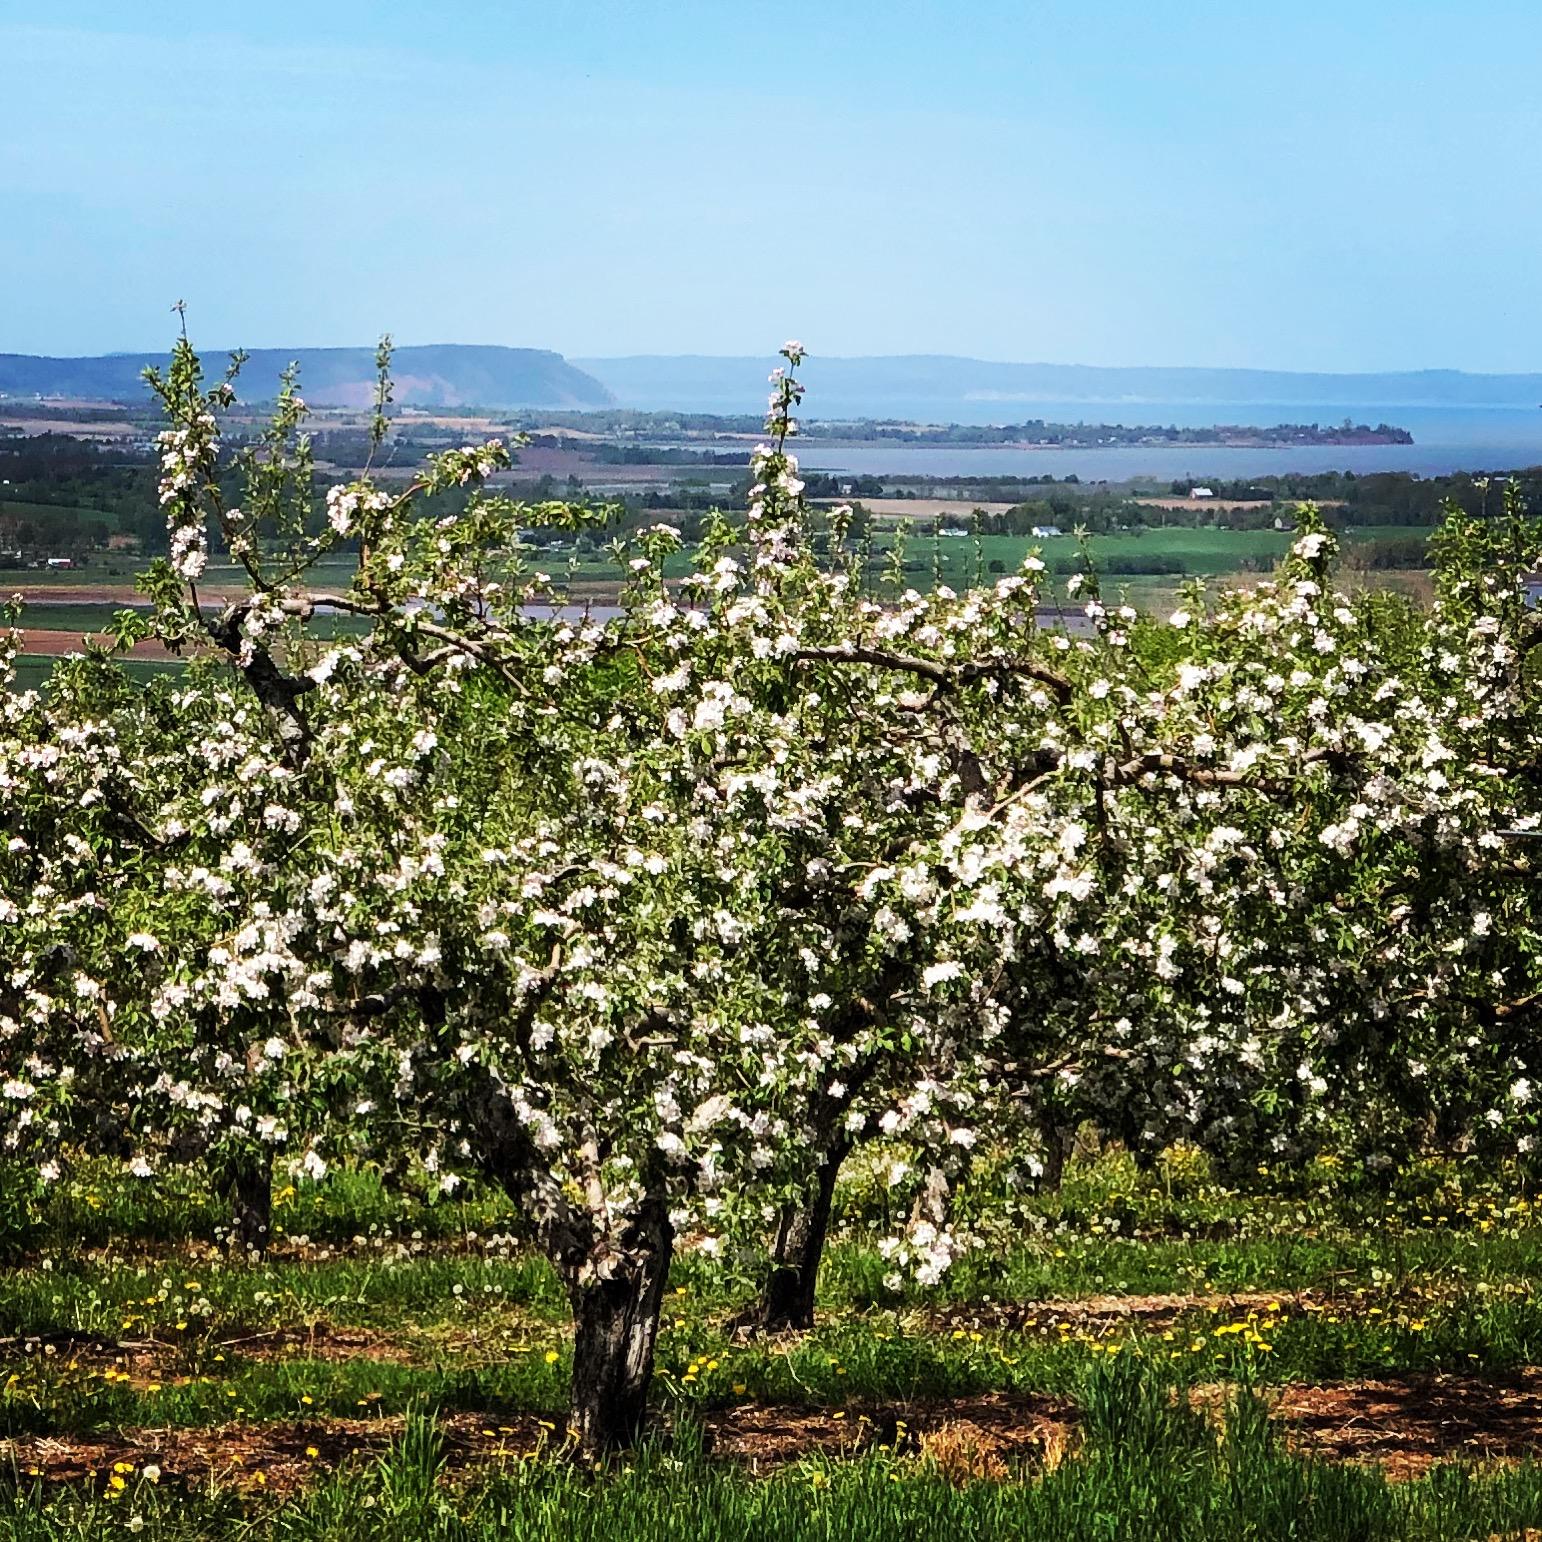 Apple Orchard in Greenwich, Nova Scotia overlooking Cape Blomidon